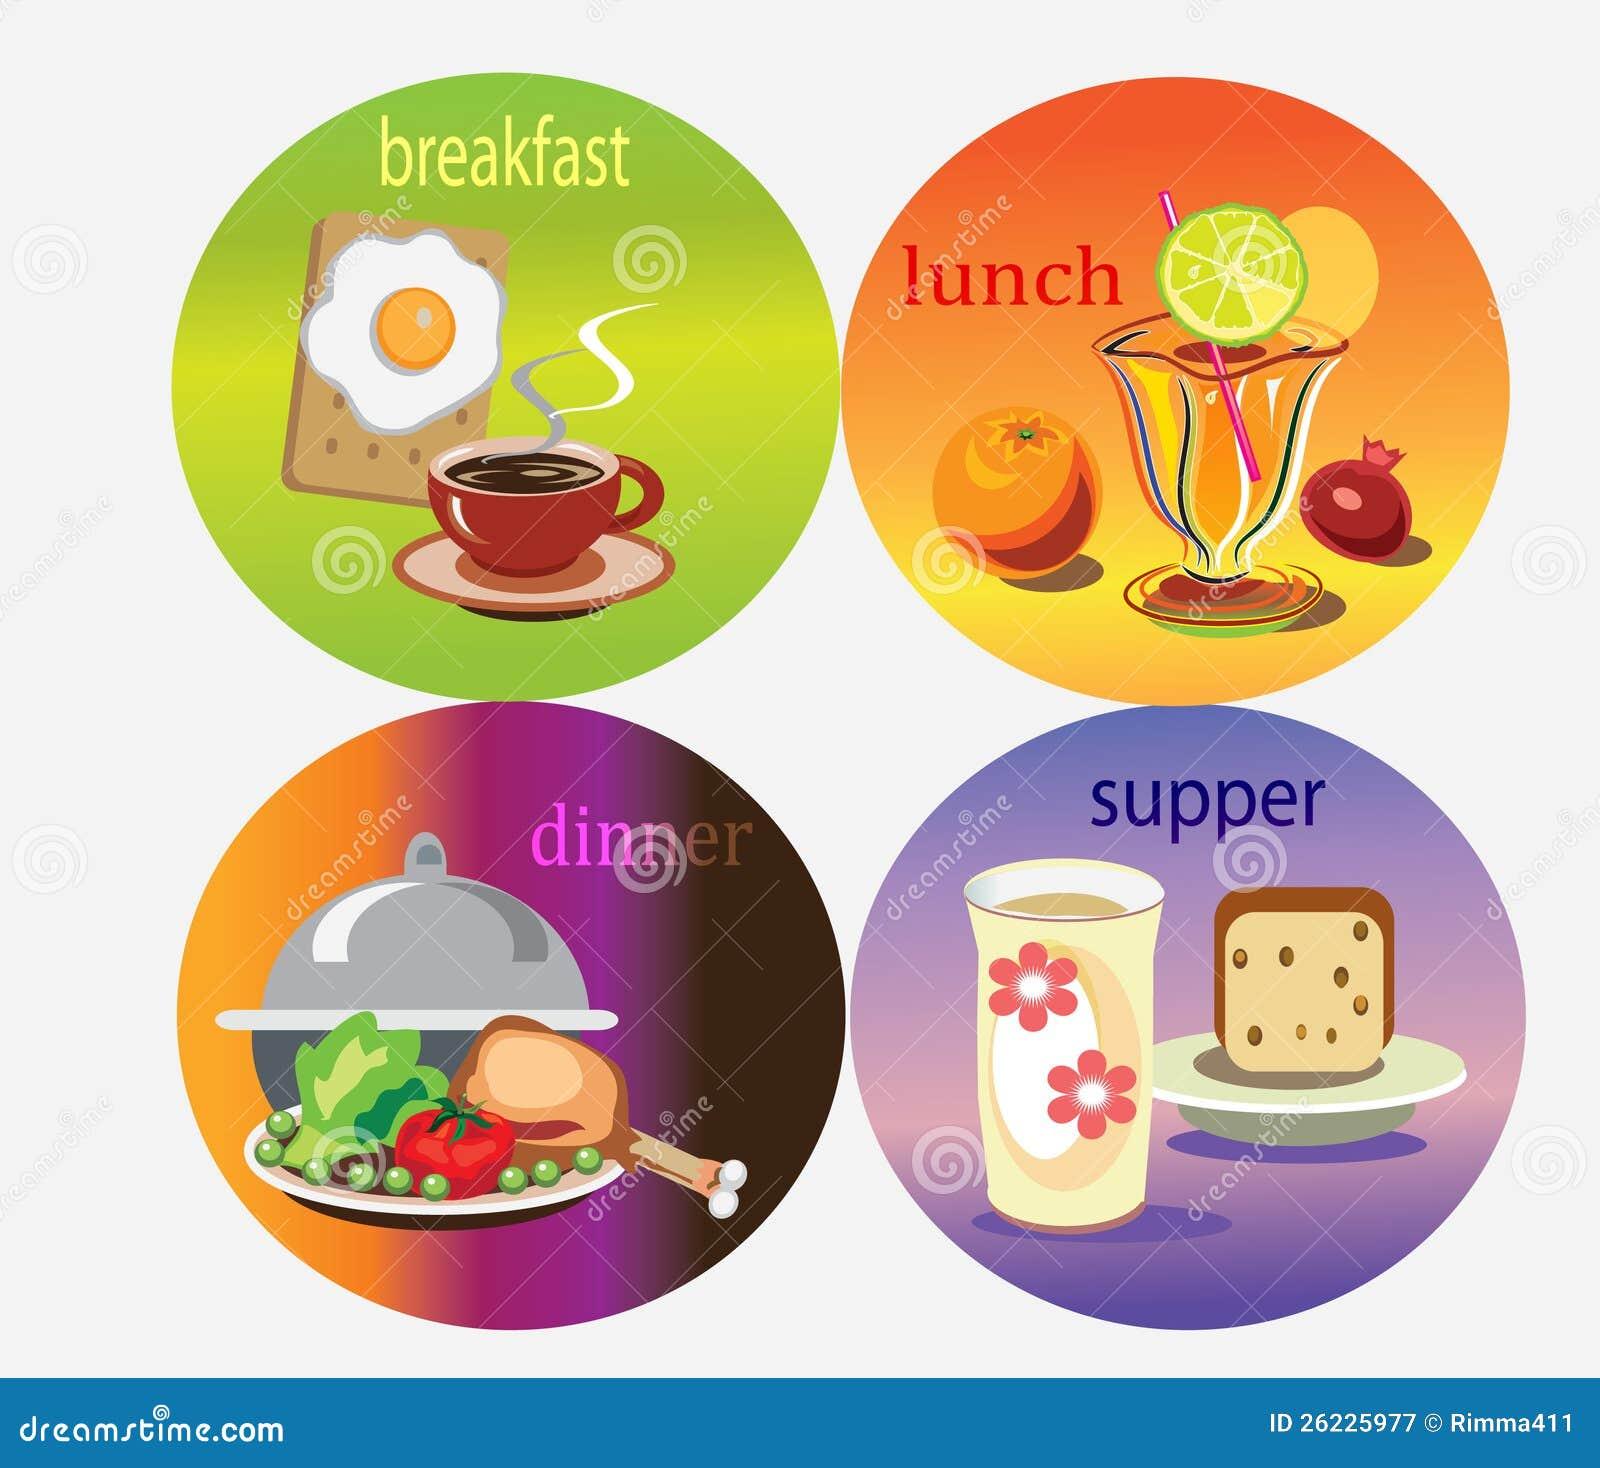 Рисунок ужин завтрак обед